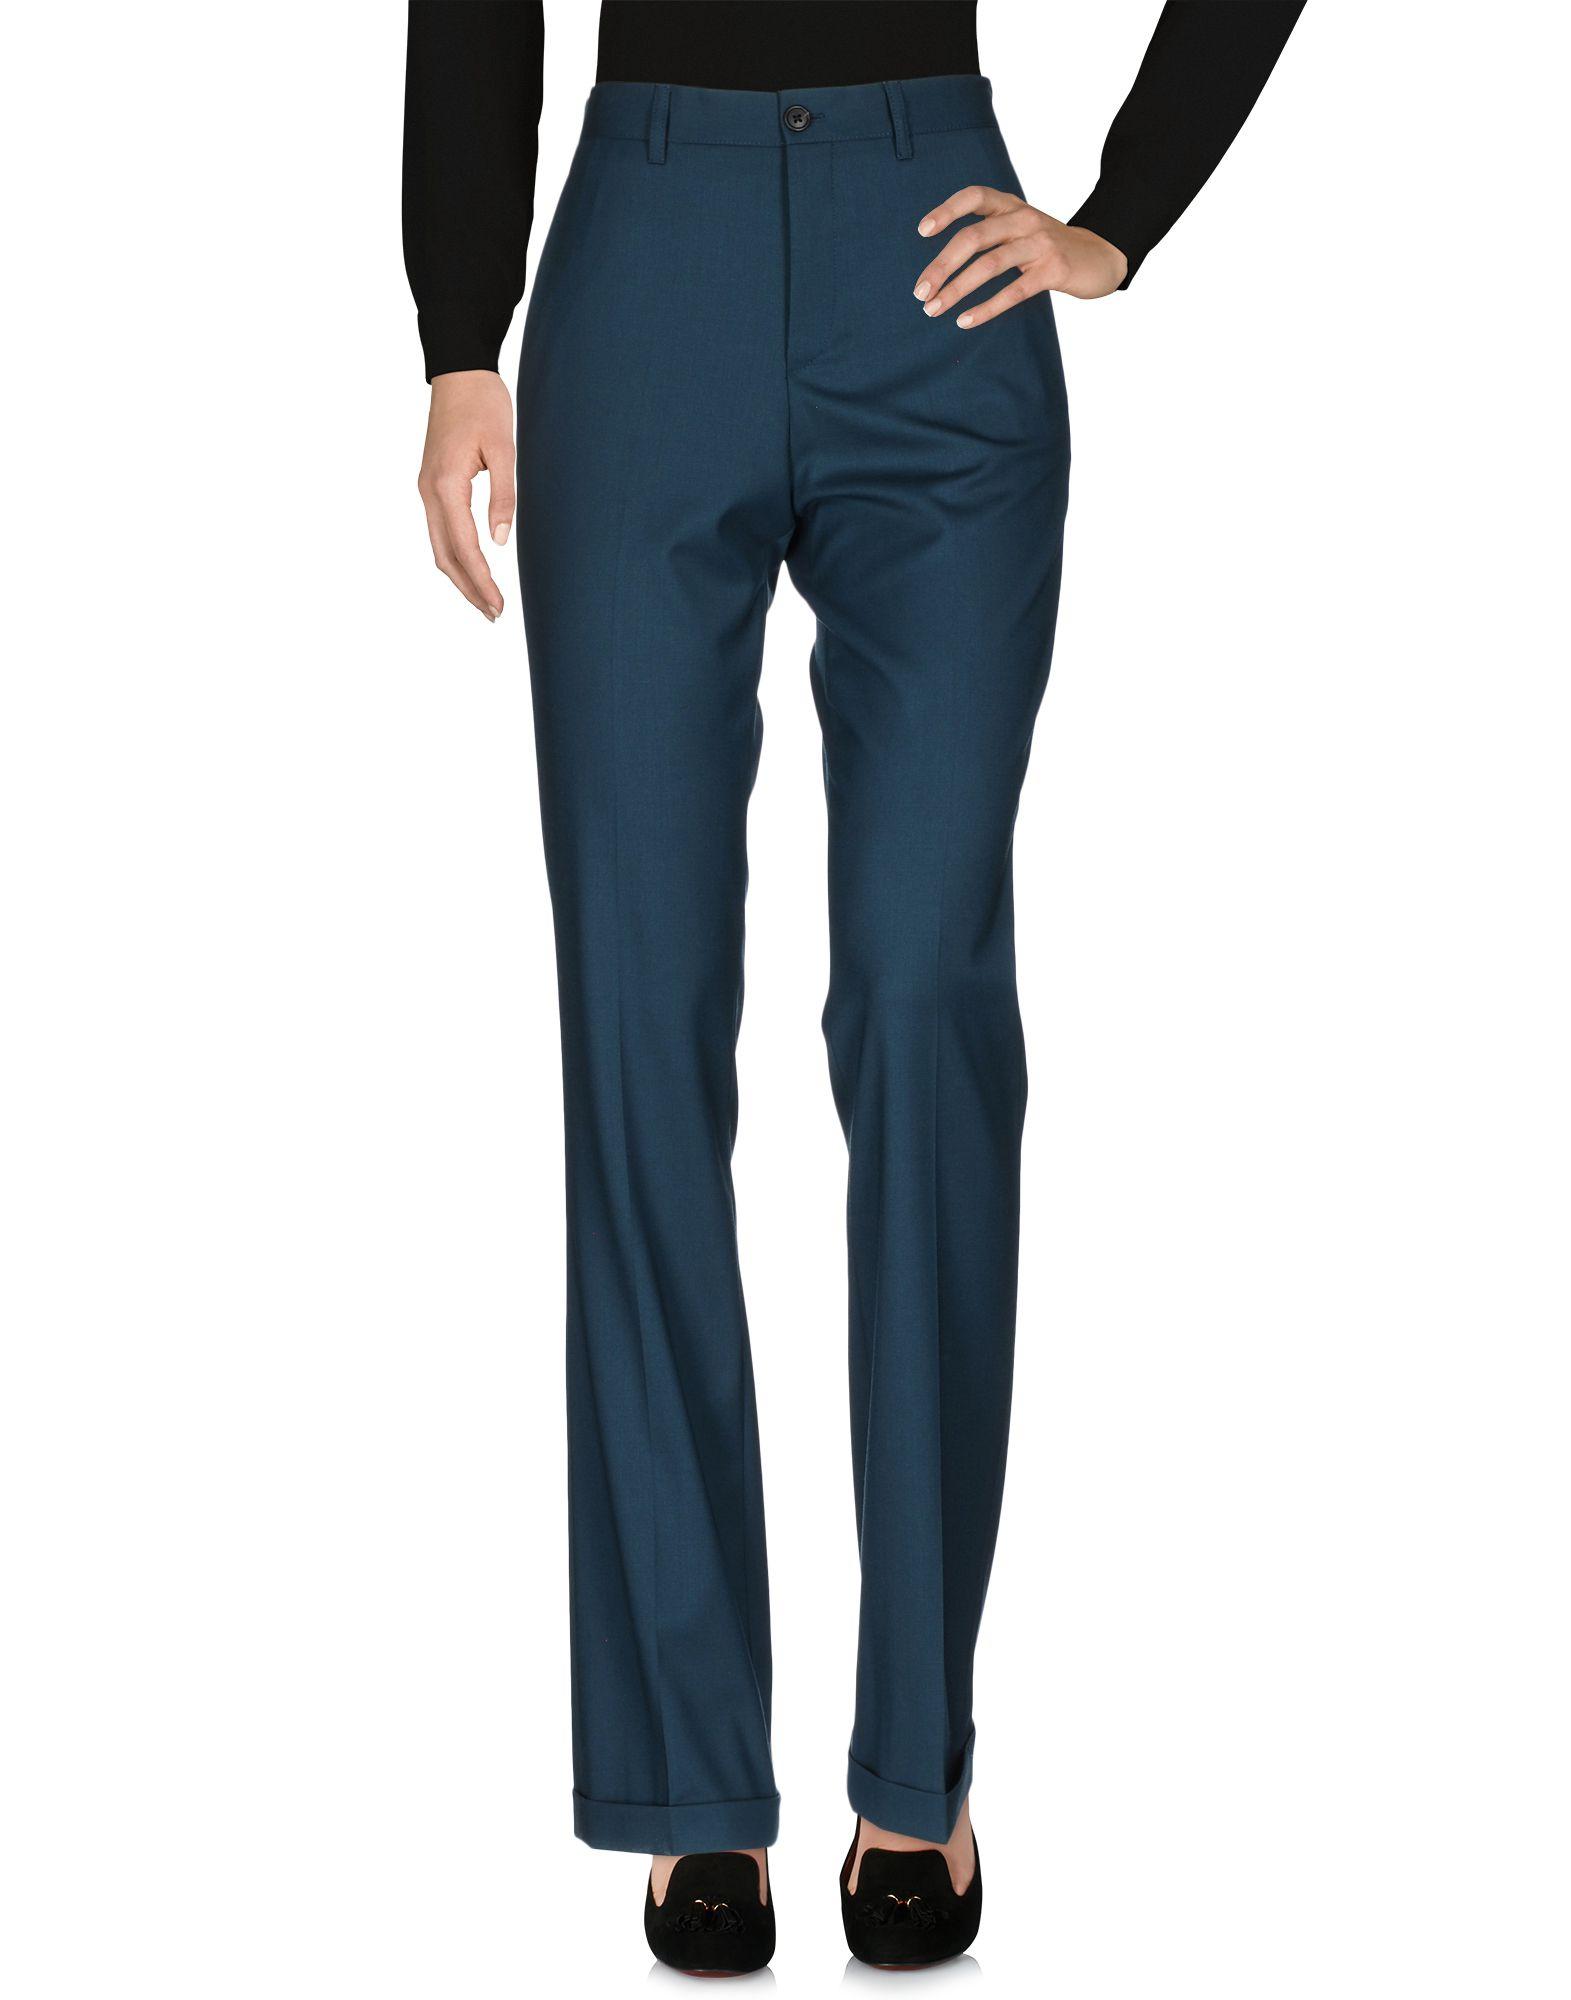 Pantalone Miu Miu Donna - Acquista online su oVRjT